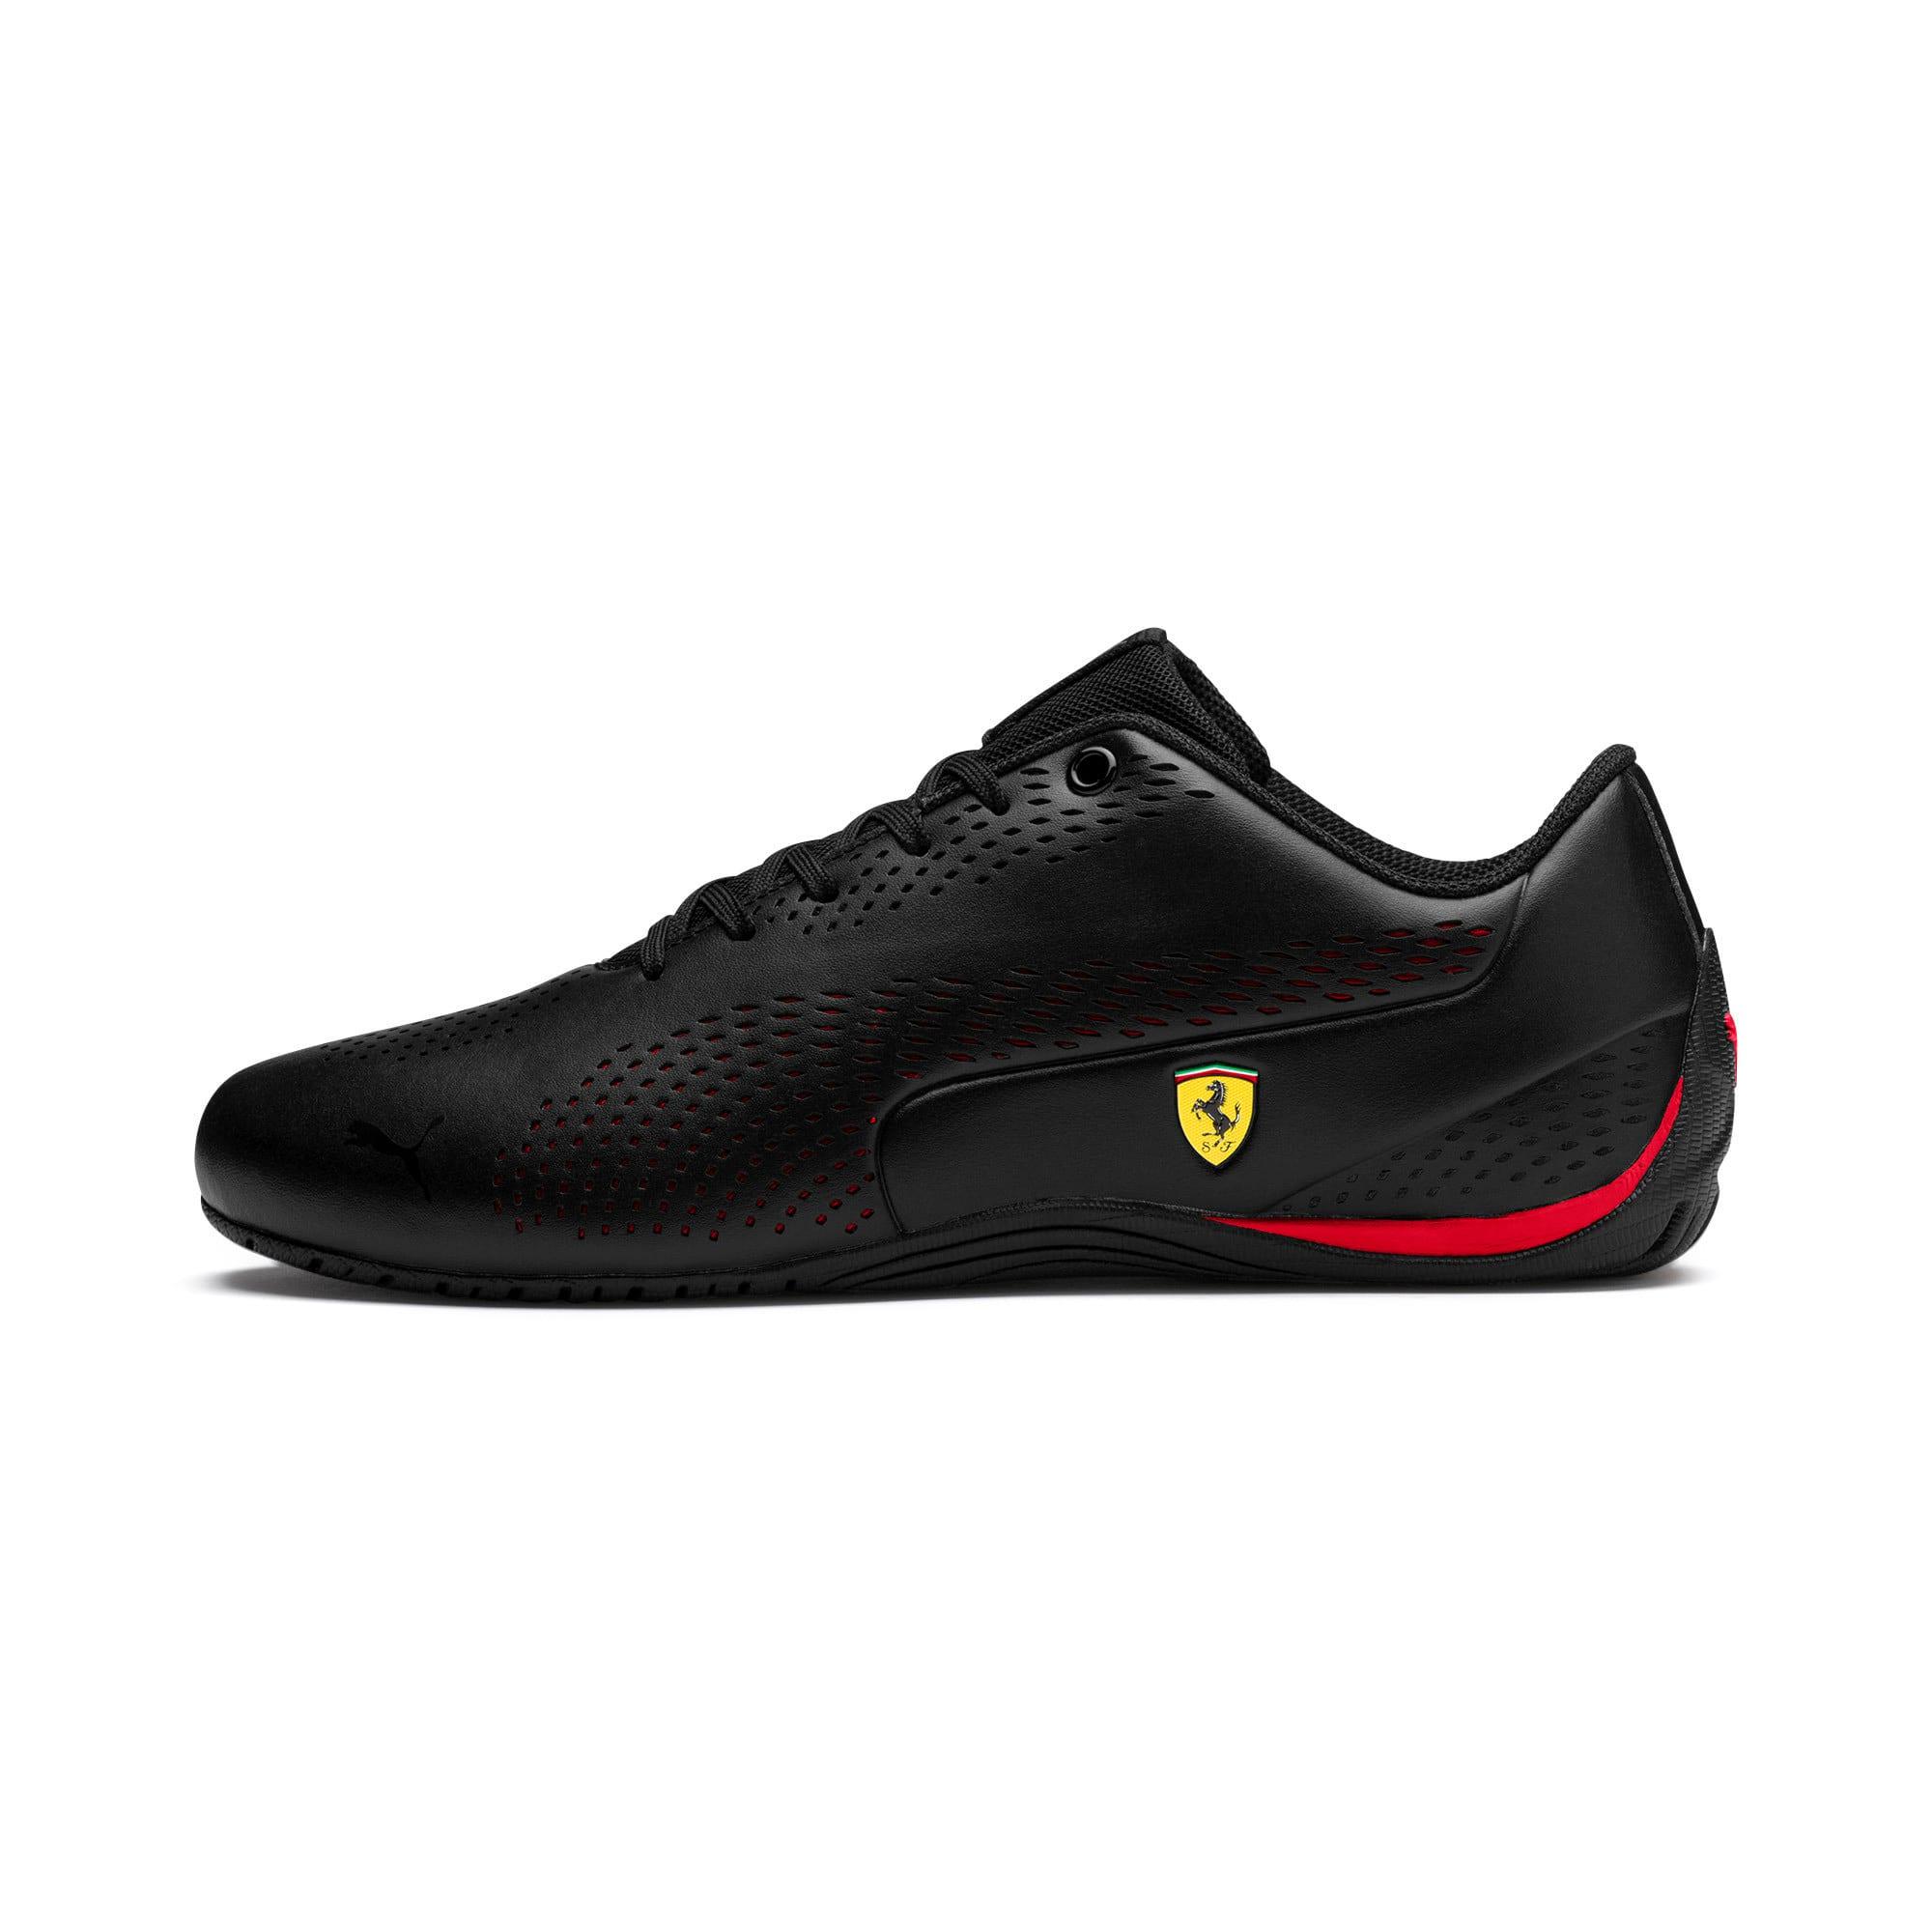 Thumbnail 1 of Ferrari Drift Cat 5 Ultra II Trainers, Puma Black-Rosso Corsa, medium-IND